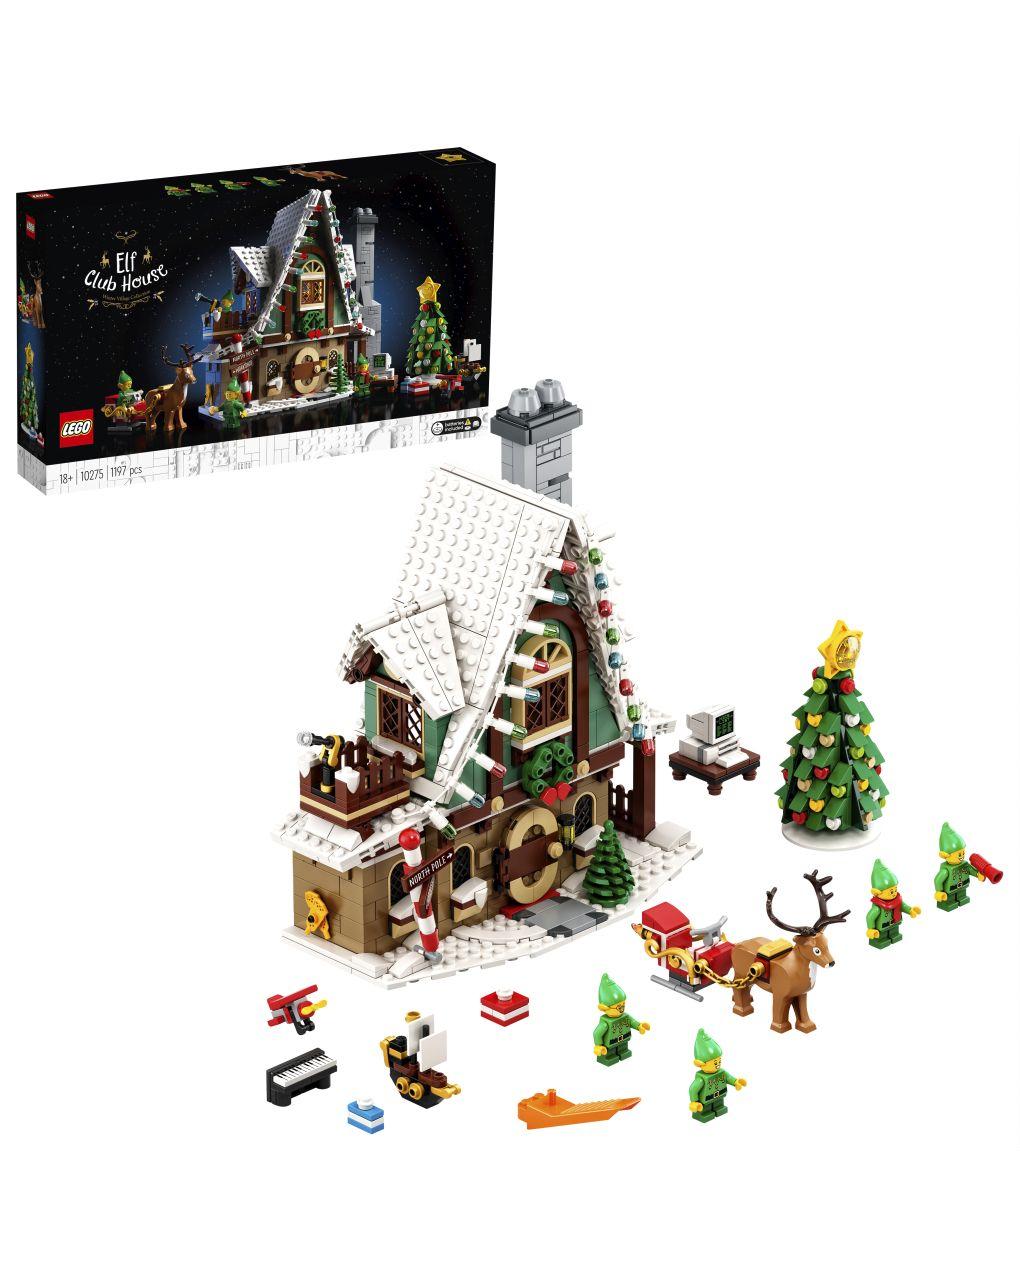 ícones de lego - casa dos elfos - 10275 - LEGO